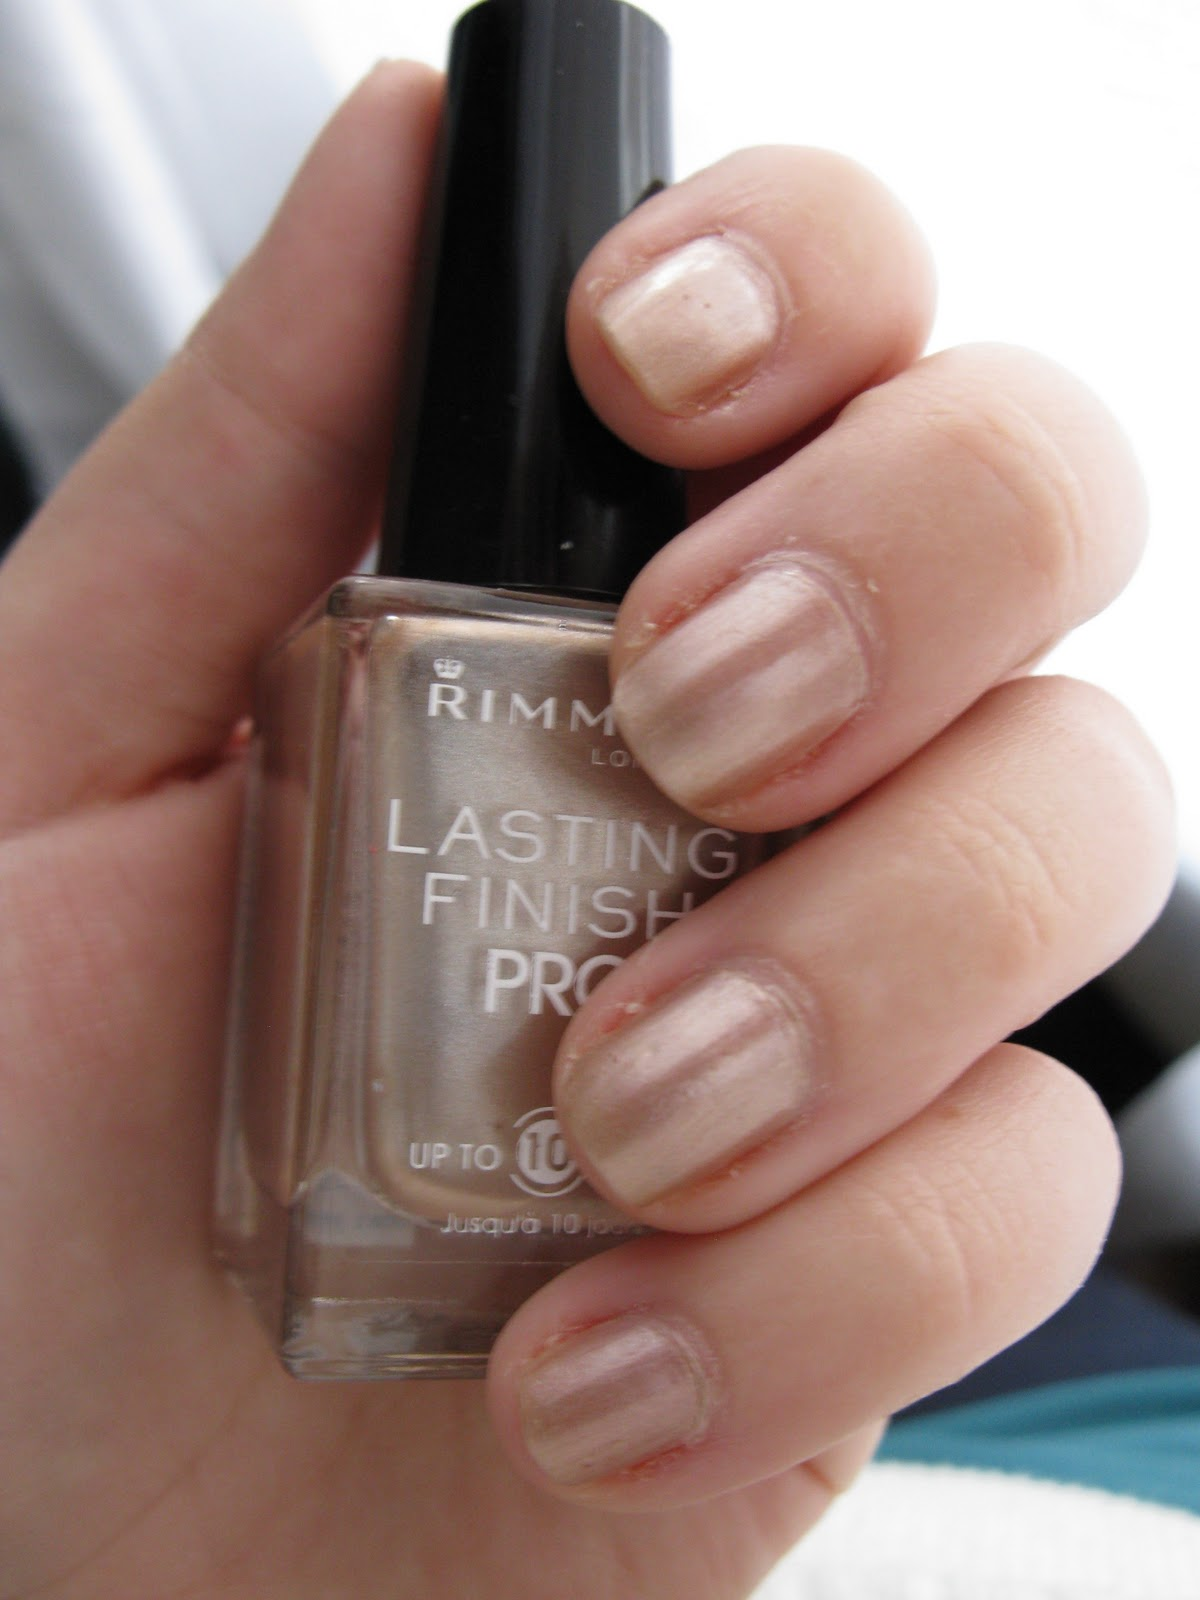 Beauty and the Newb: Rimmel London Lasting Finish Pro Nail Polish in ...